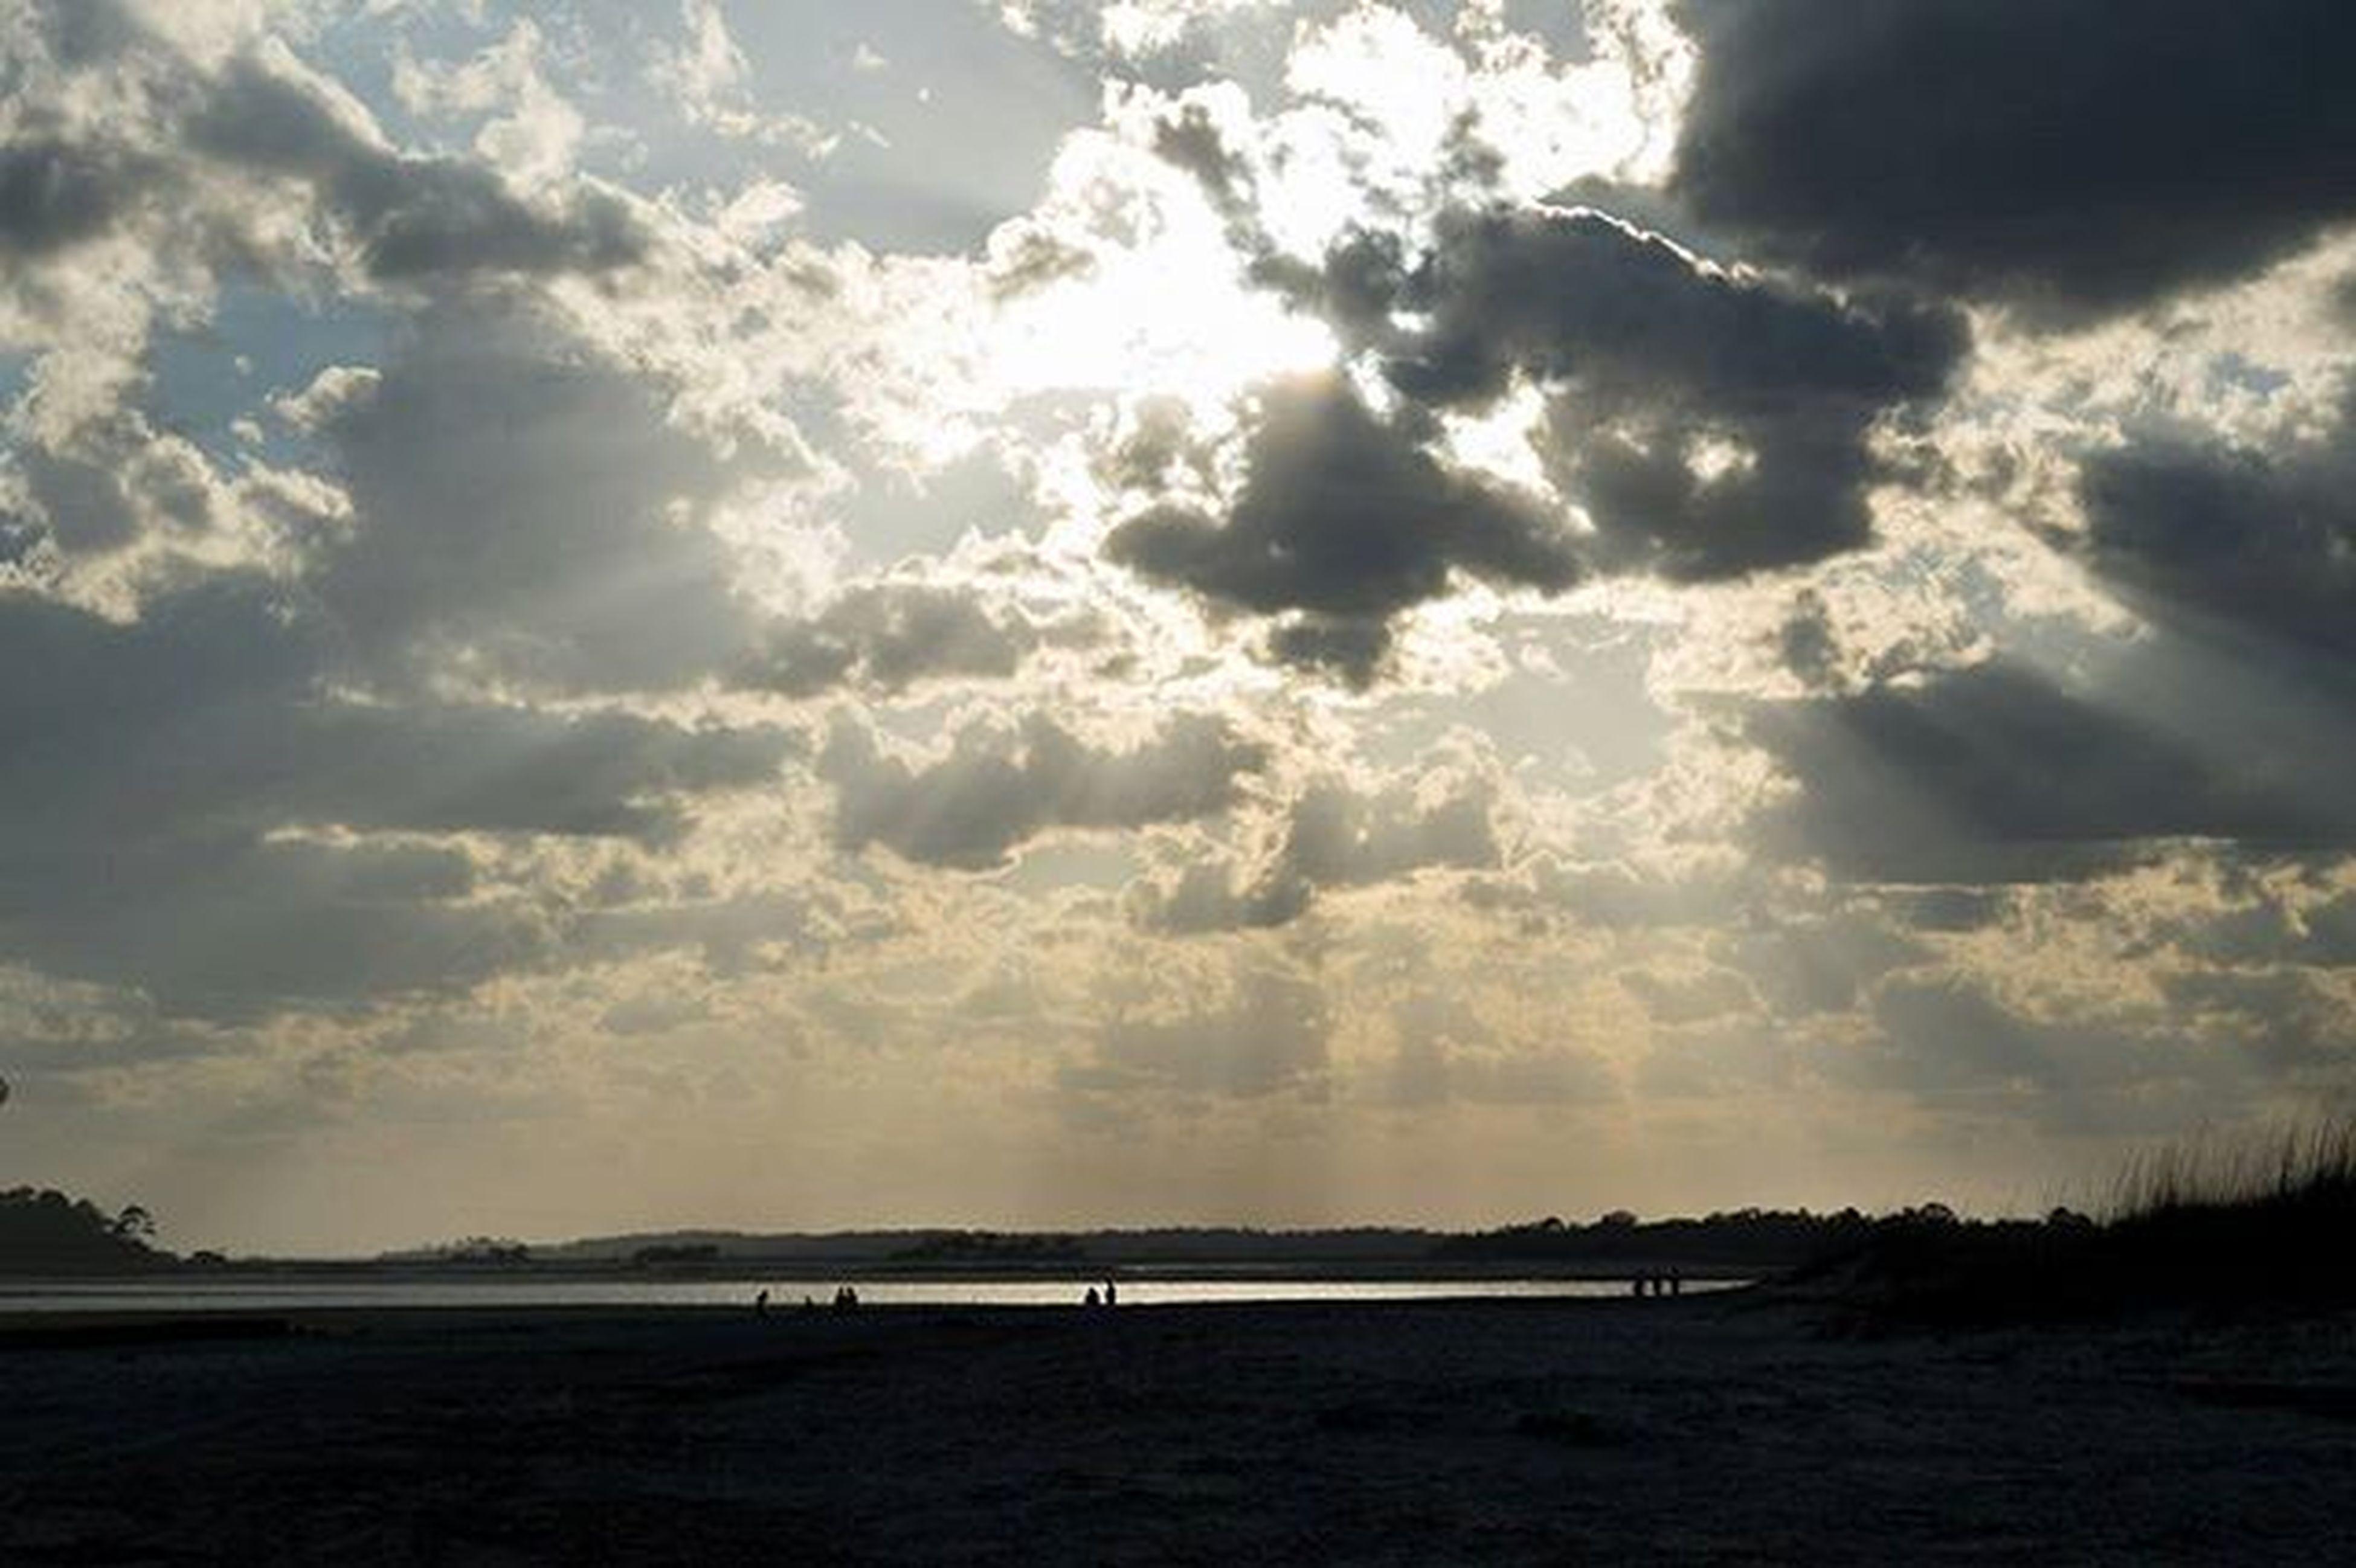 sky, tranquil scene, tranquility, scenics, beauty in nature, cloud - sky, sea, water, nature, sunset, beach, silhouette, cloudy, idyllic, cloud, horizon over water, sunlight, sun, shore, landscape